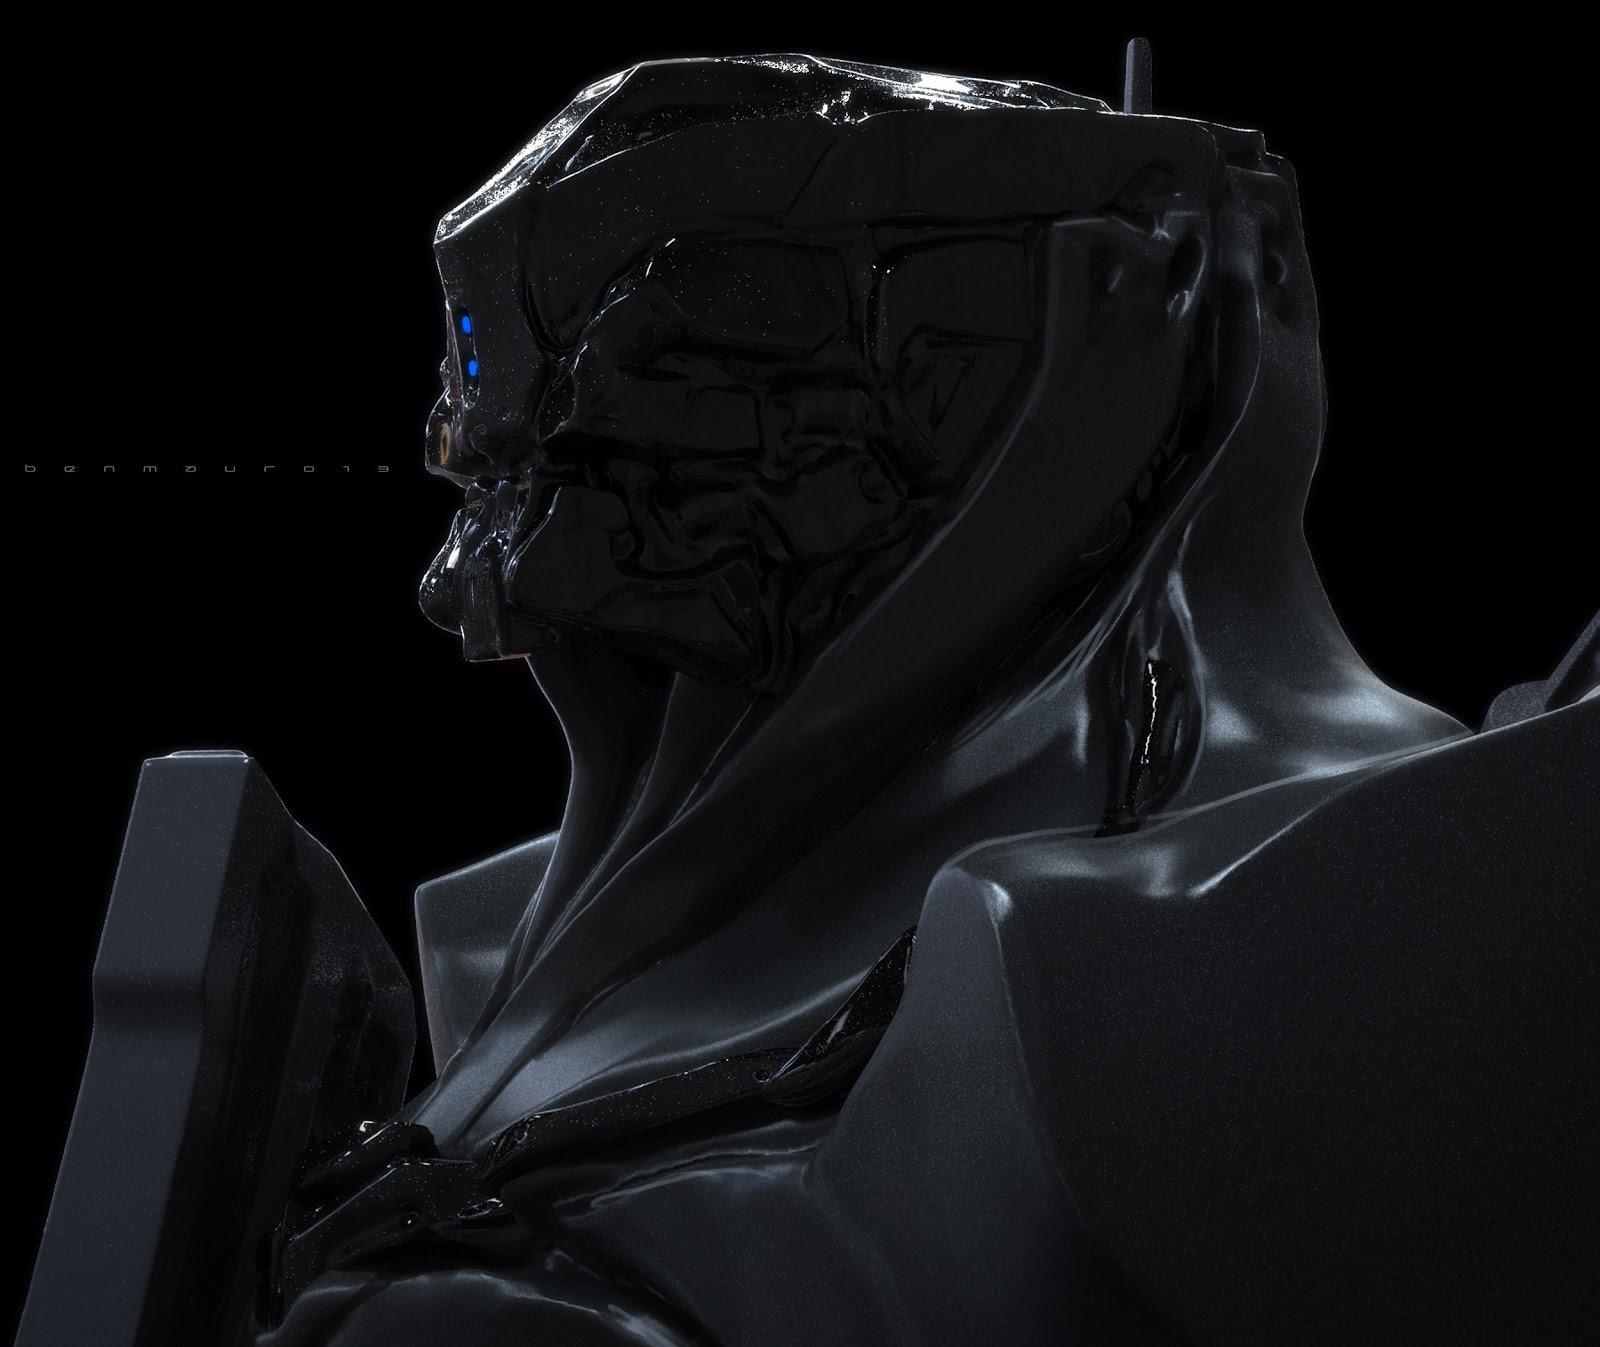 Ben mauro key robot 01 bm